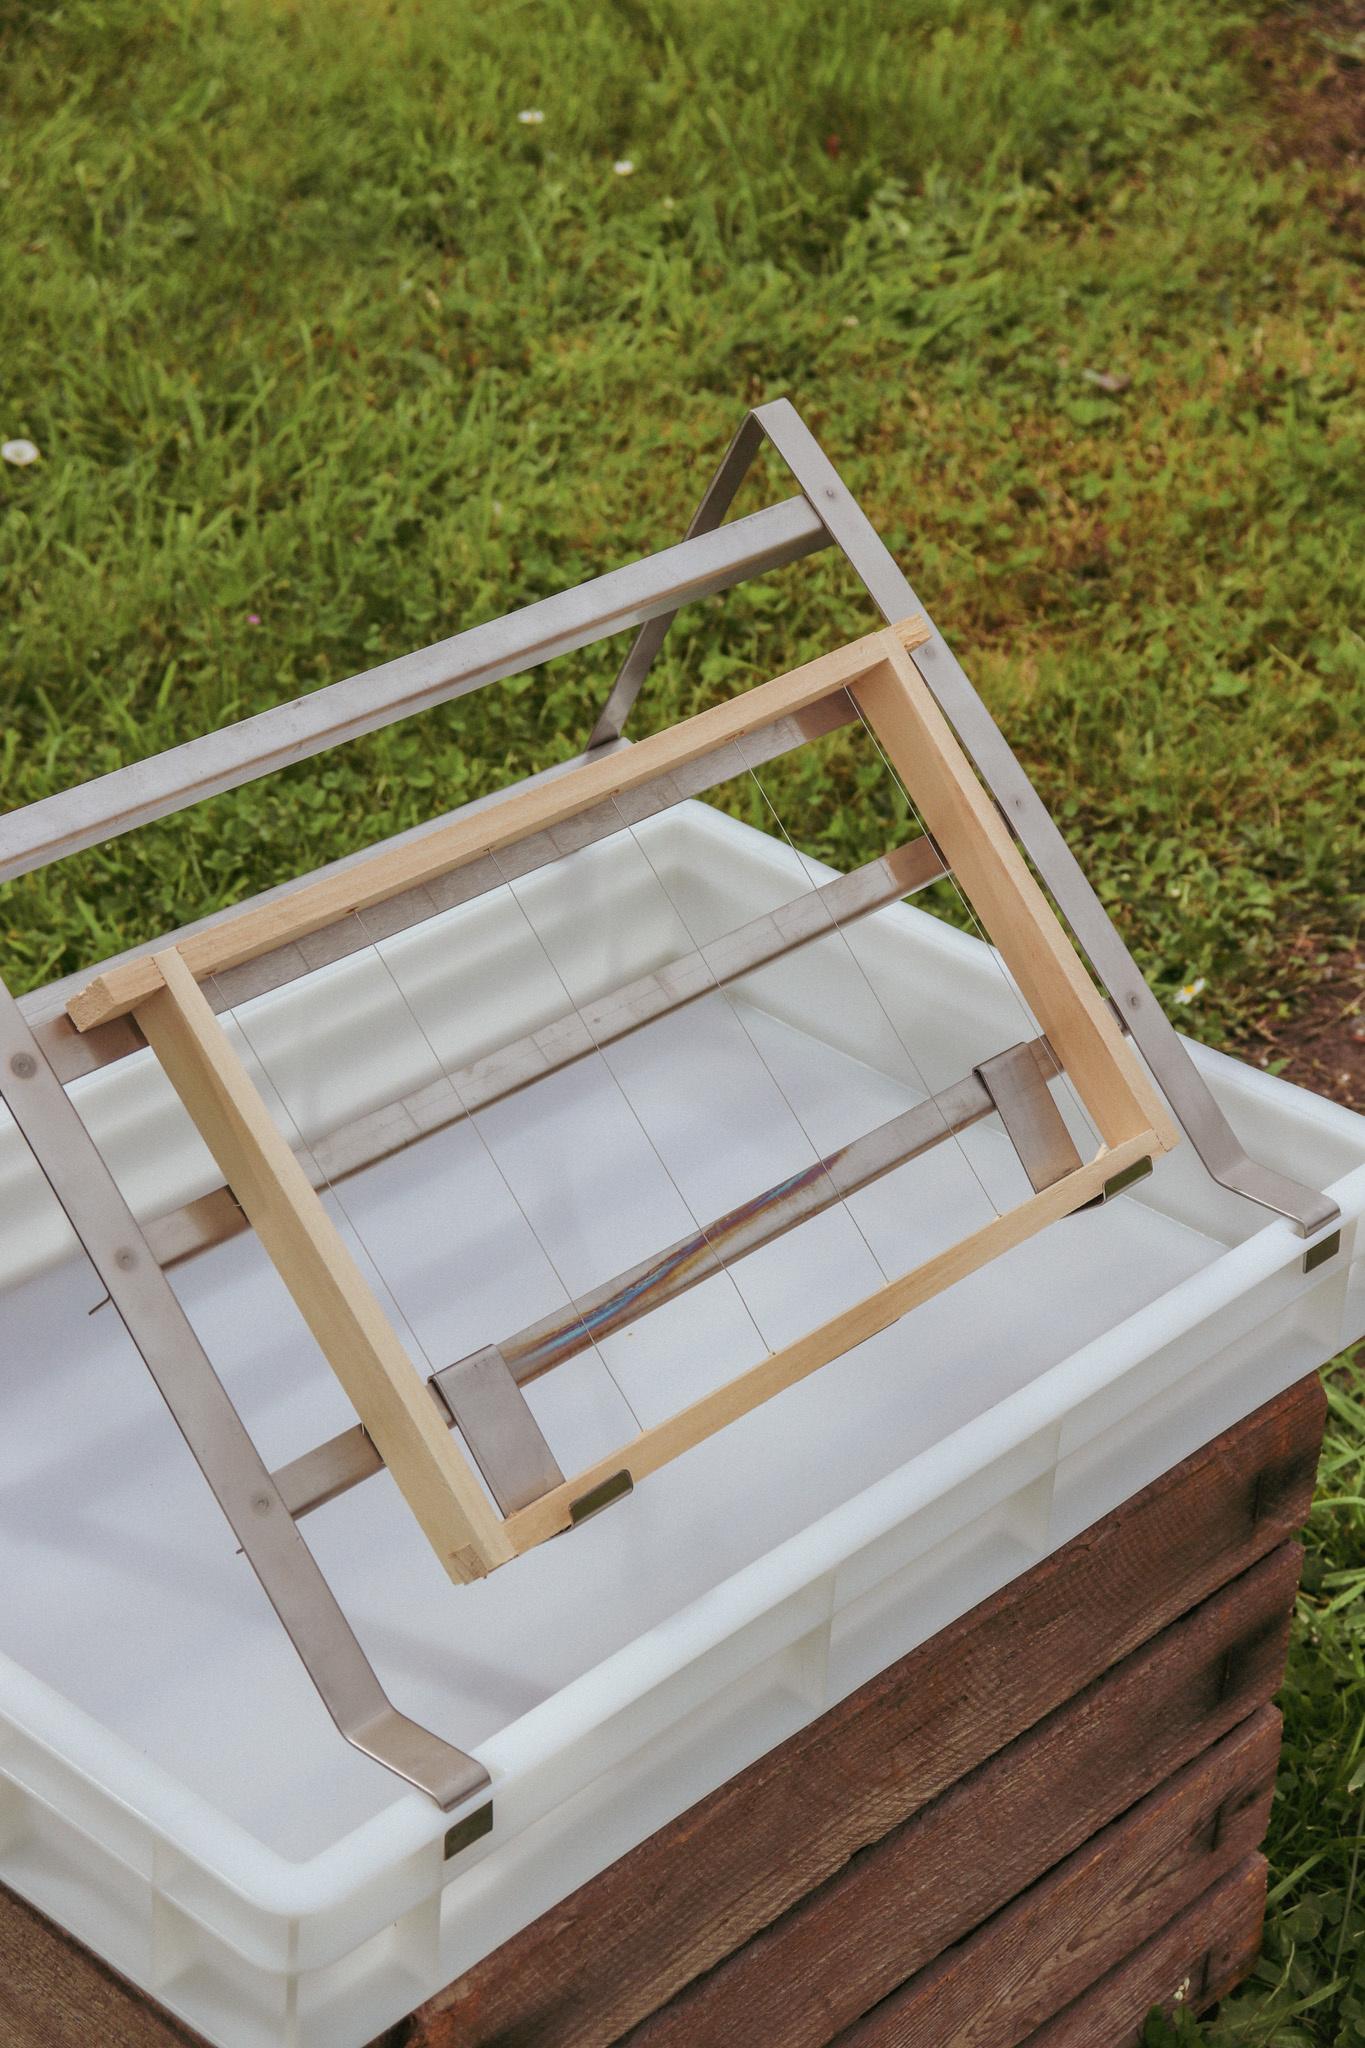 Starterspakket 'honingoogst 1 - 5 bijenkasten'-5